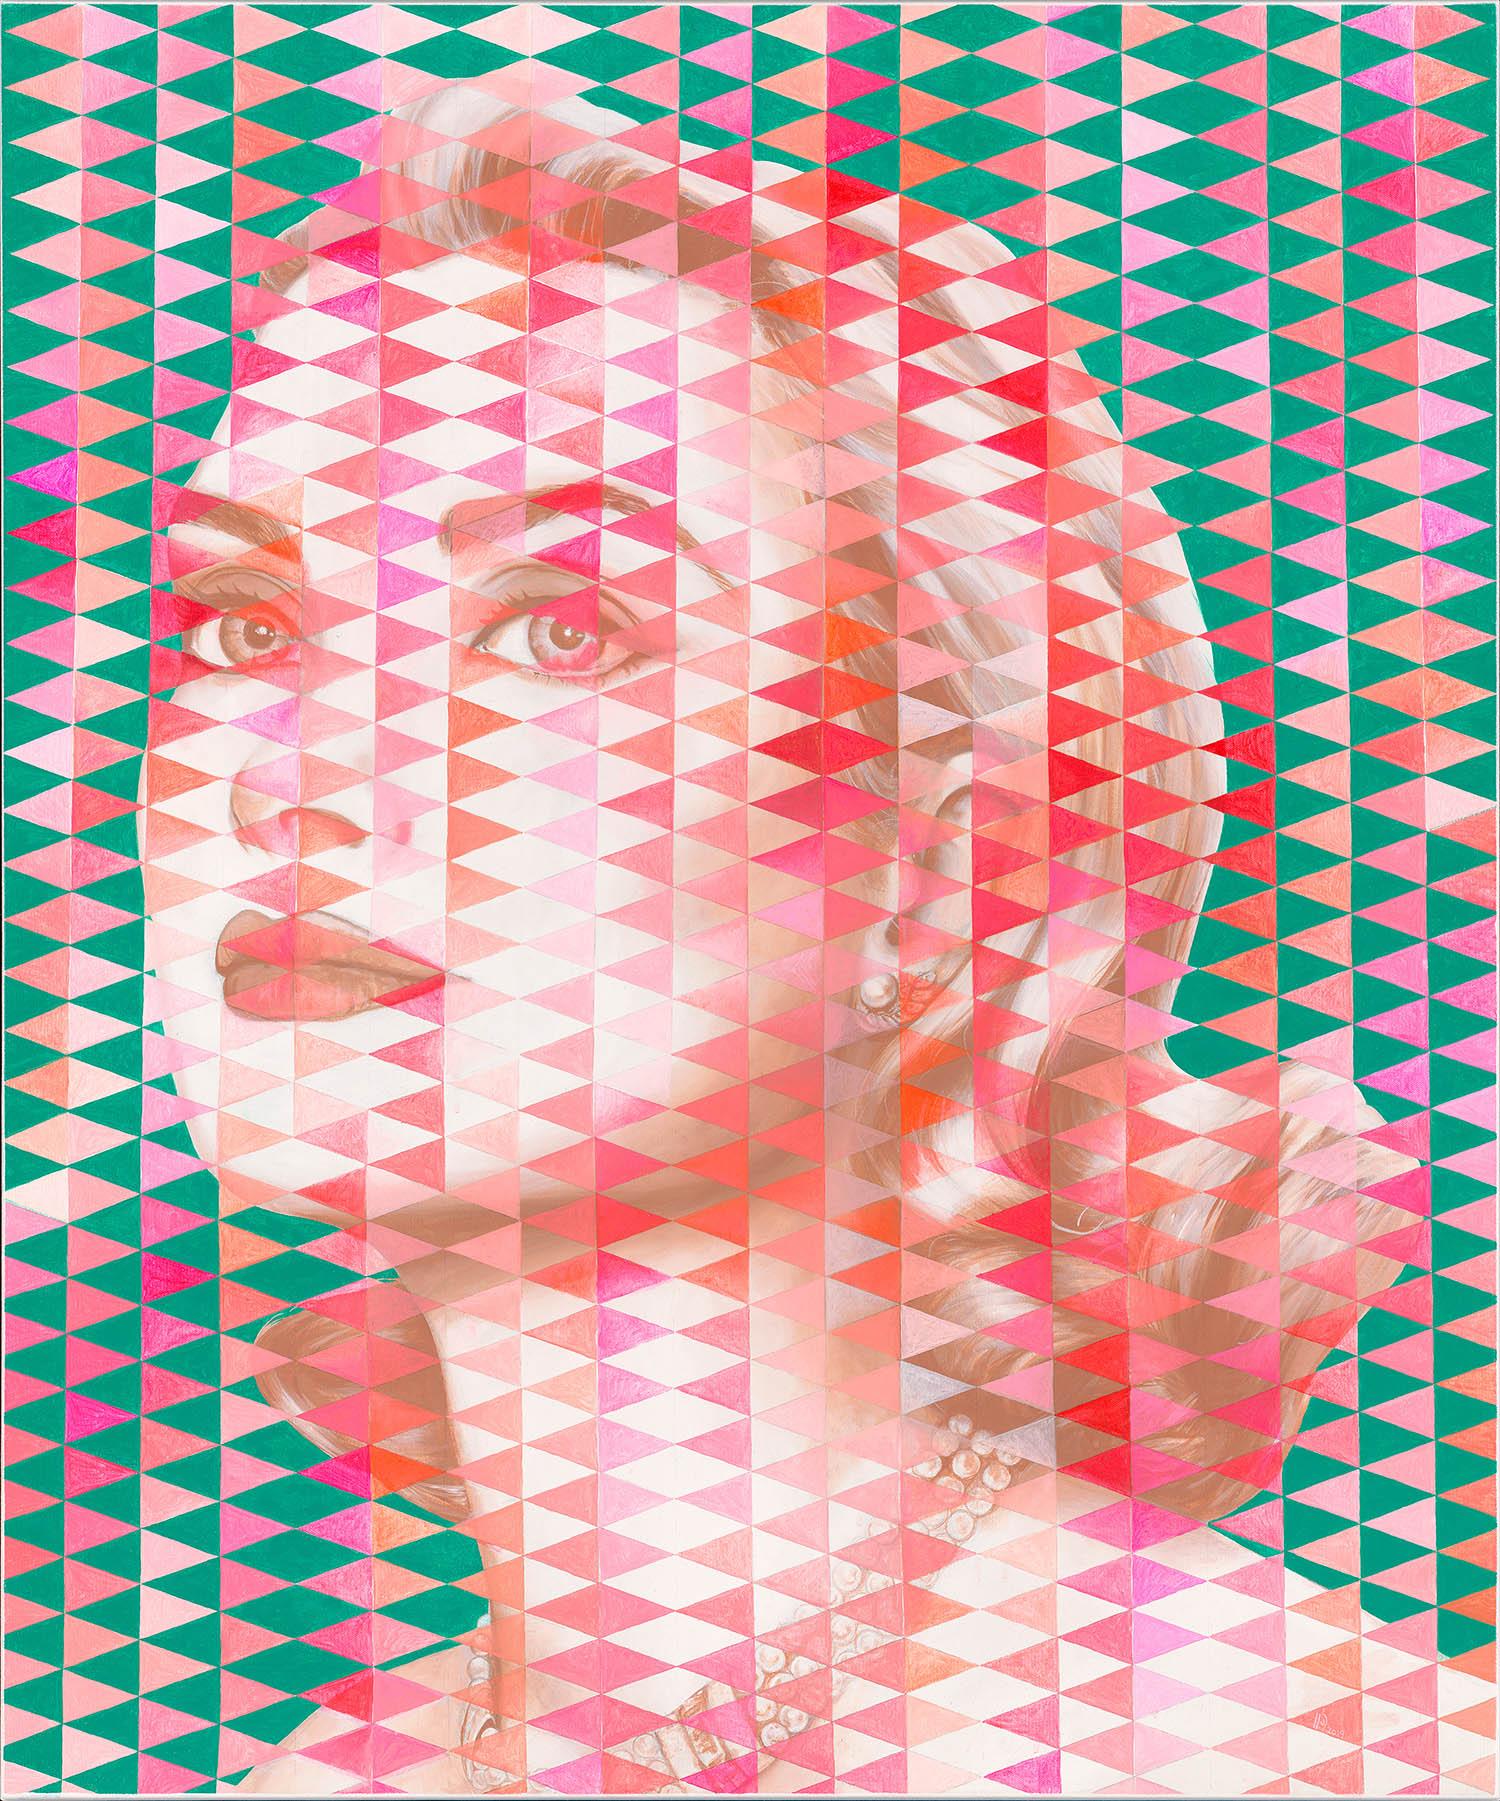 Gracia Patricia I / Acryl auf Leinwand 100x120cm © Rita Stern Miltenberg